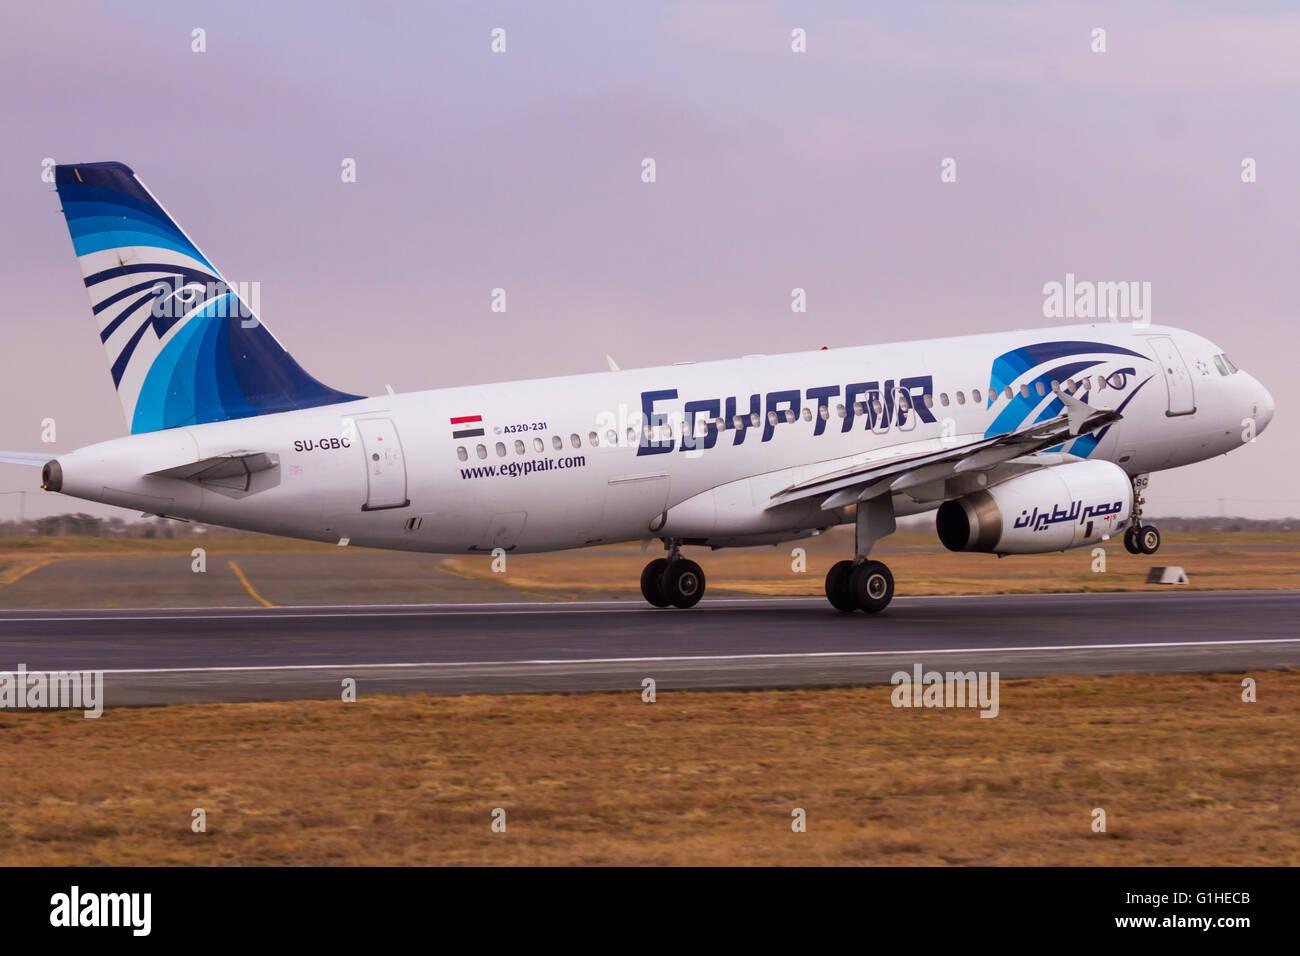 Jomo kenyatta international airport stock photos jomo kenyatta international airport stock - Egyptair airport office number ...